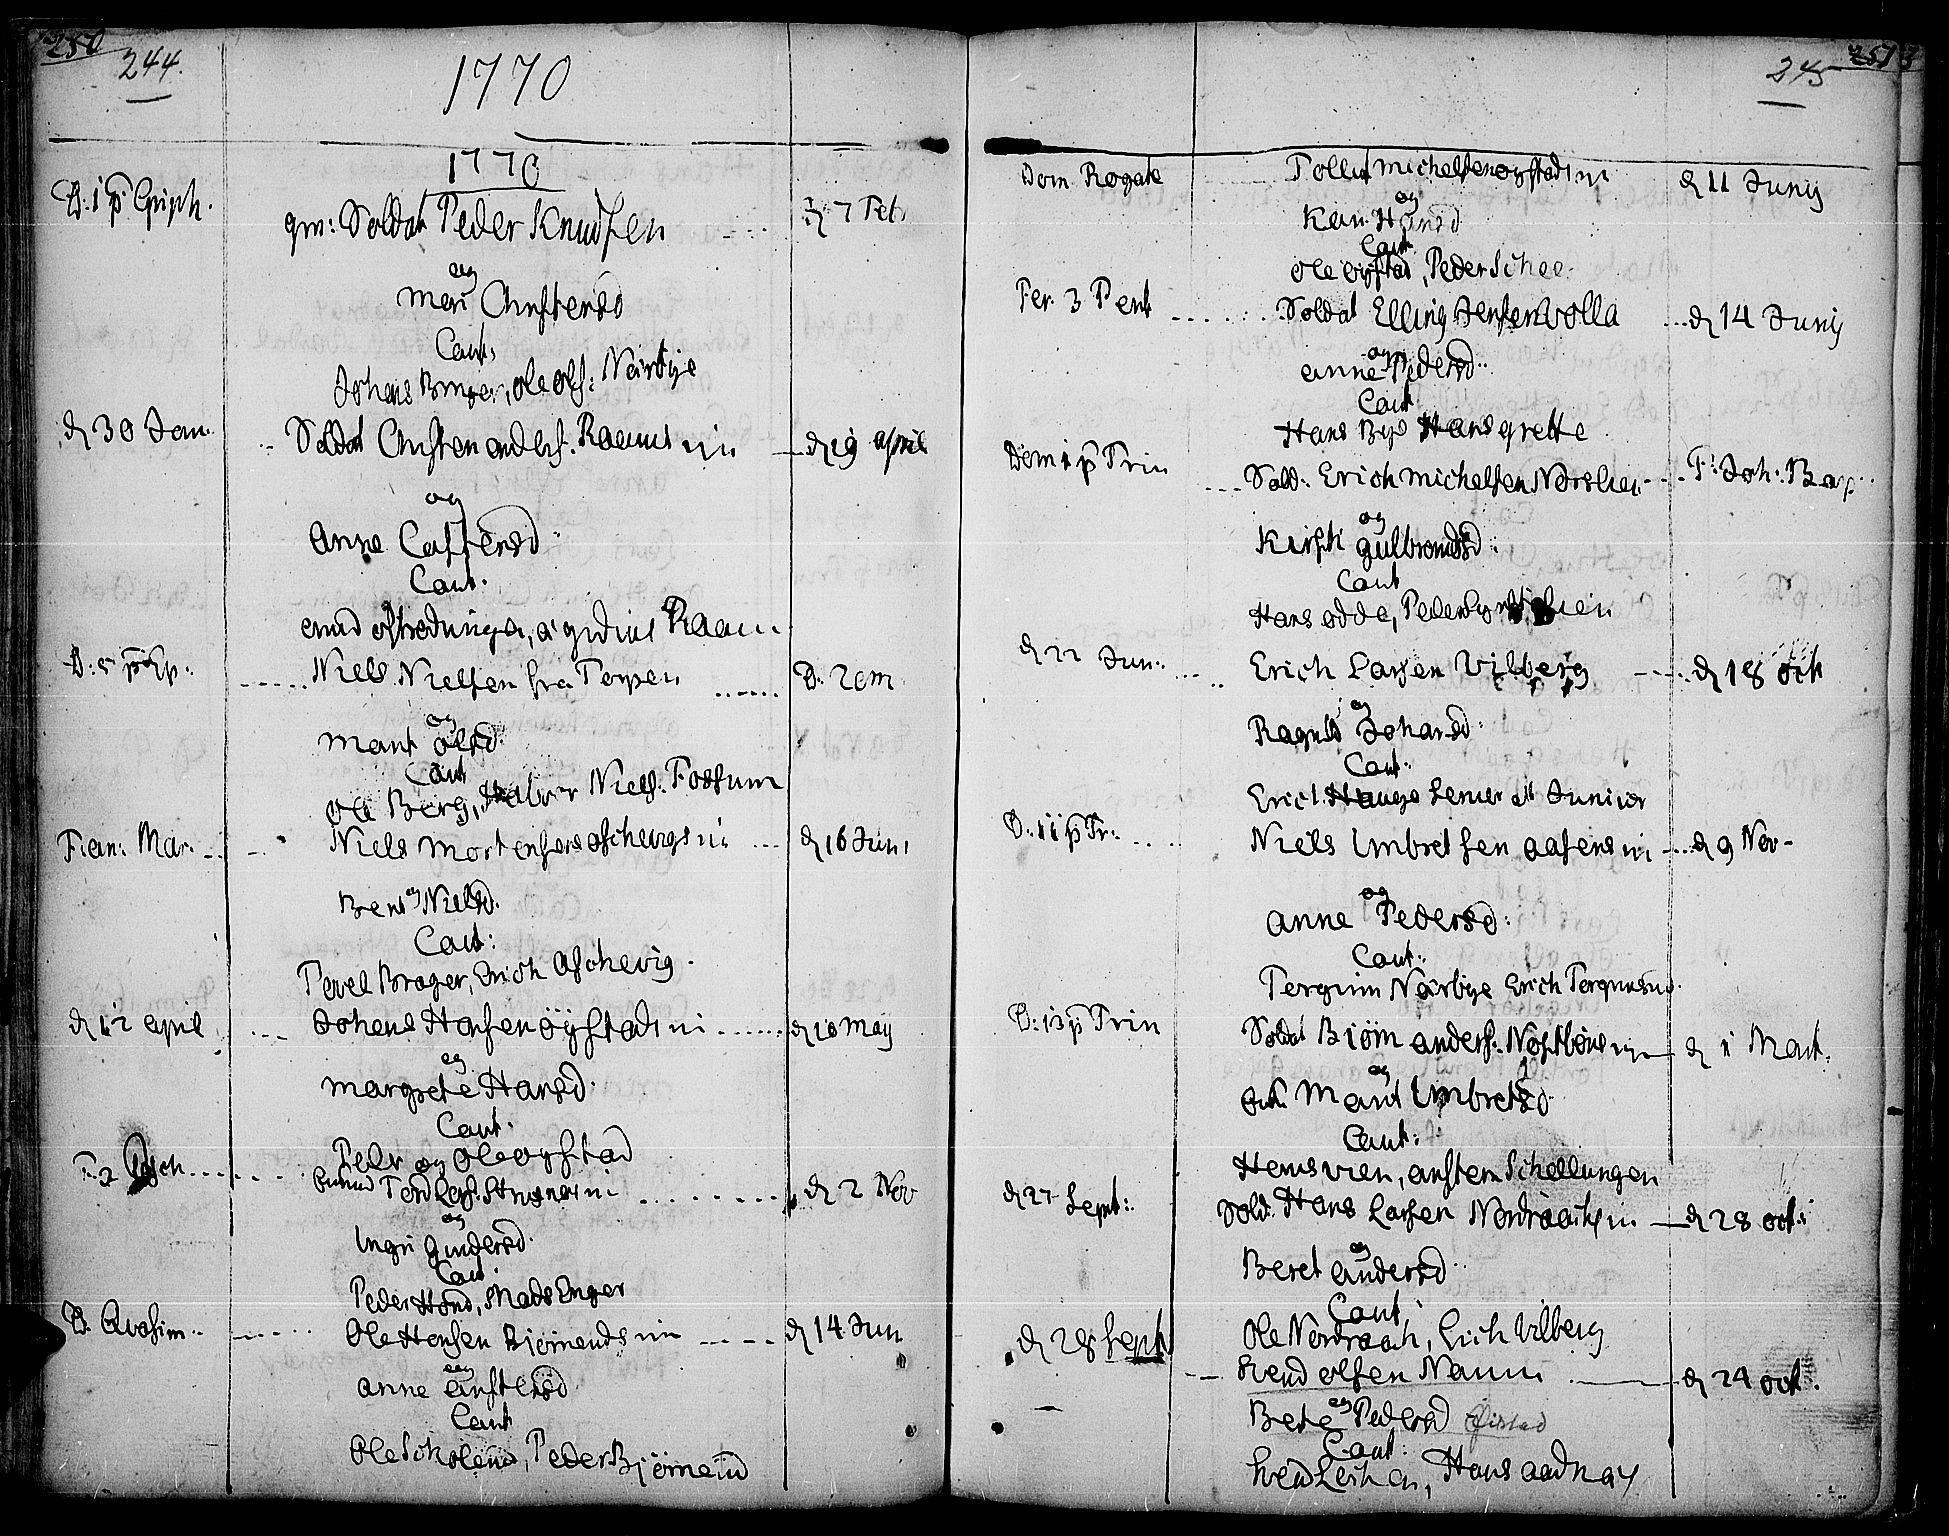 SAH, Land prestekontor, Ministerialbok nr. 5, 1765-1784, s. 244-245